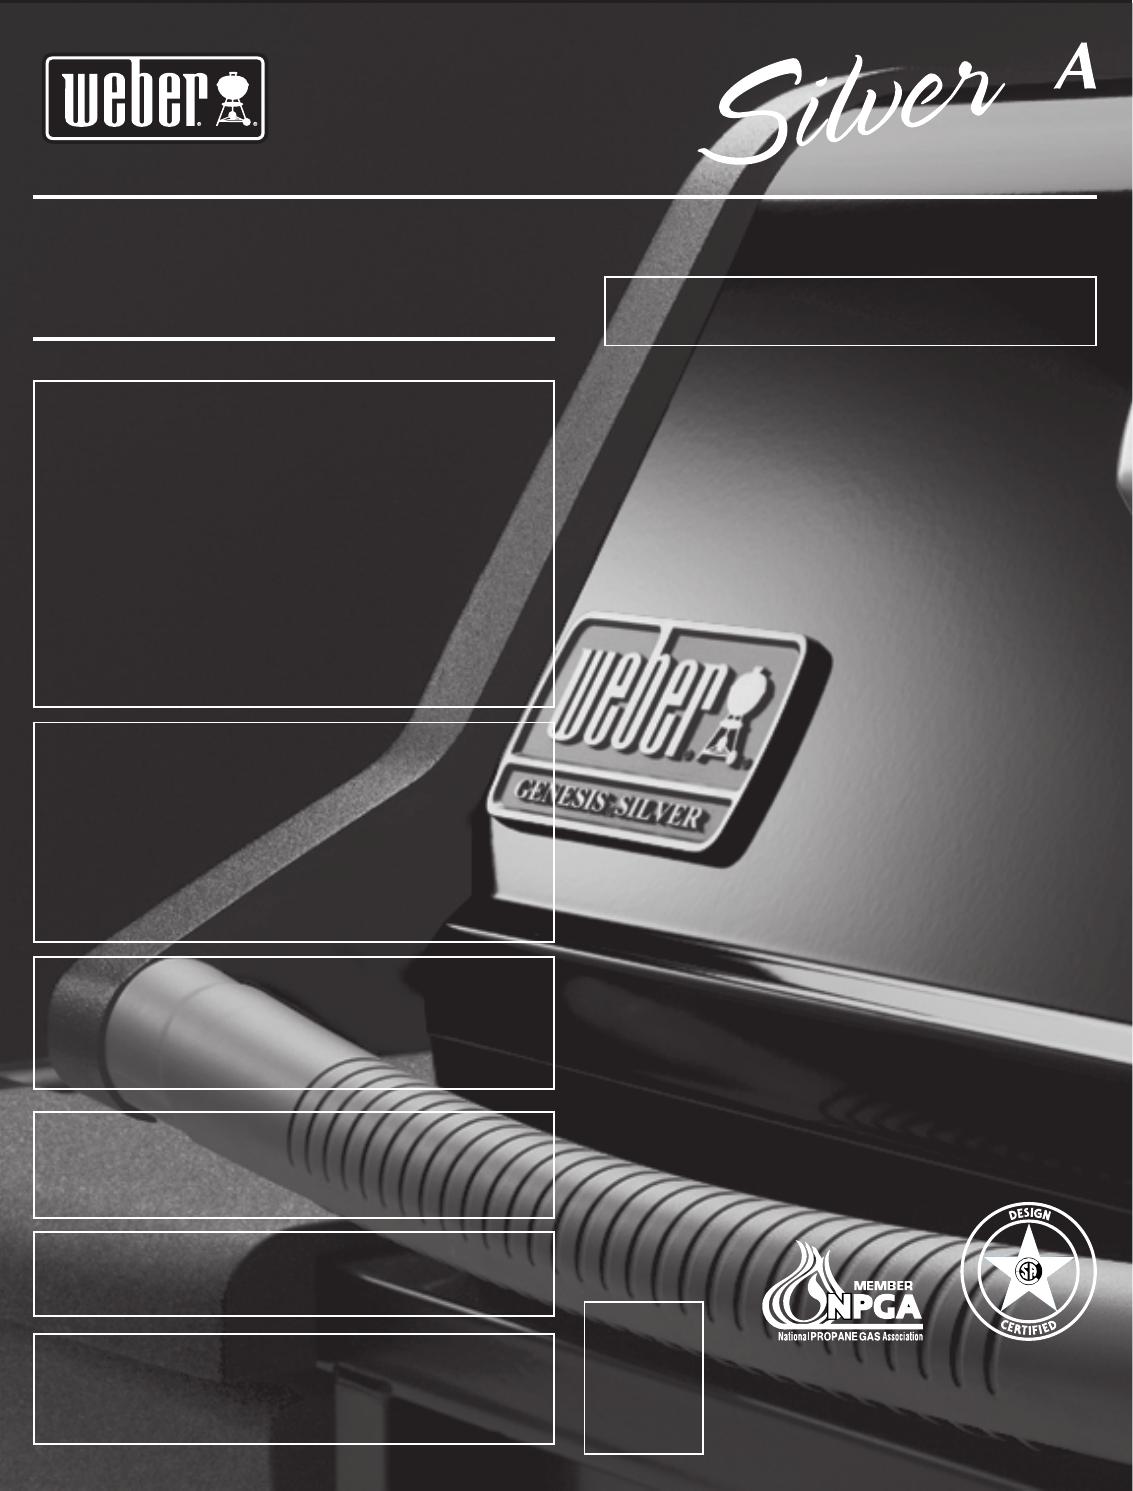 Weber 55545 Owners Manual Genesis Silver A Lp Guide 12 05 2003 Pdf File